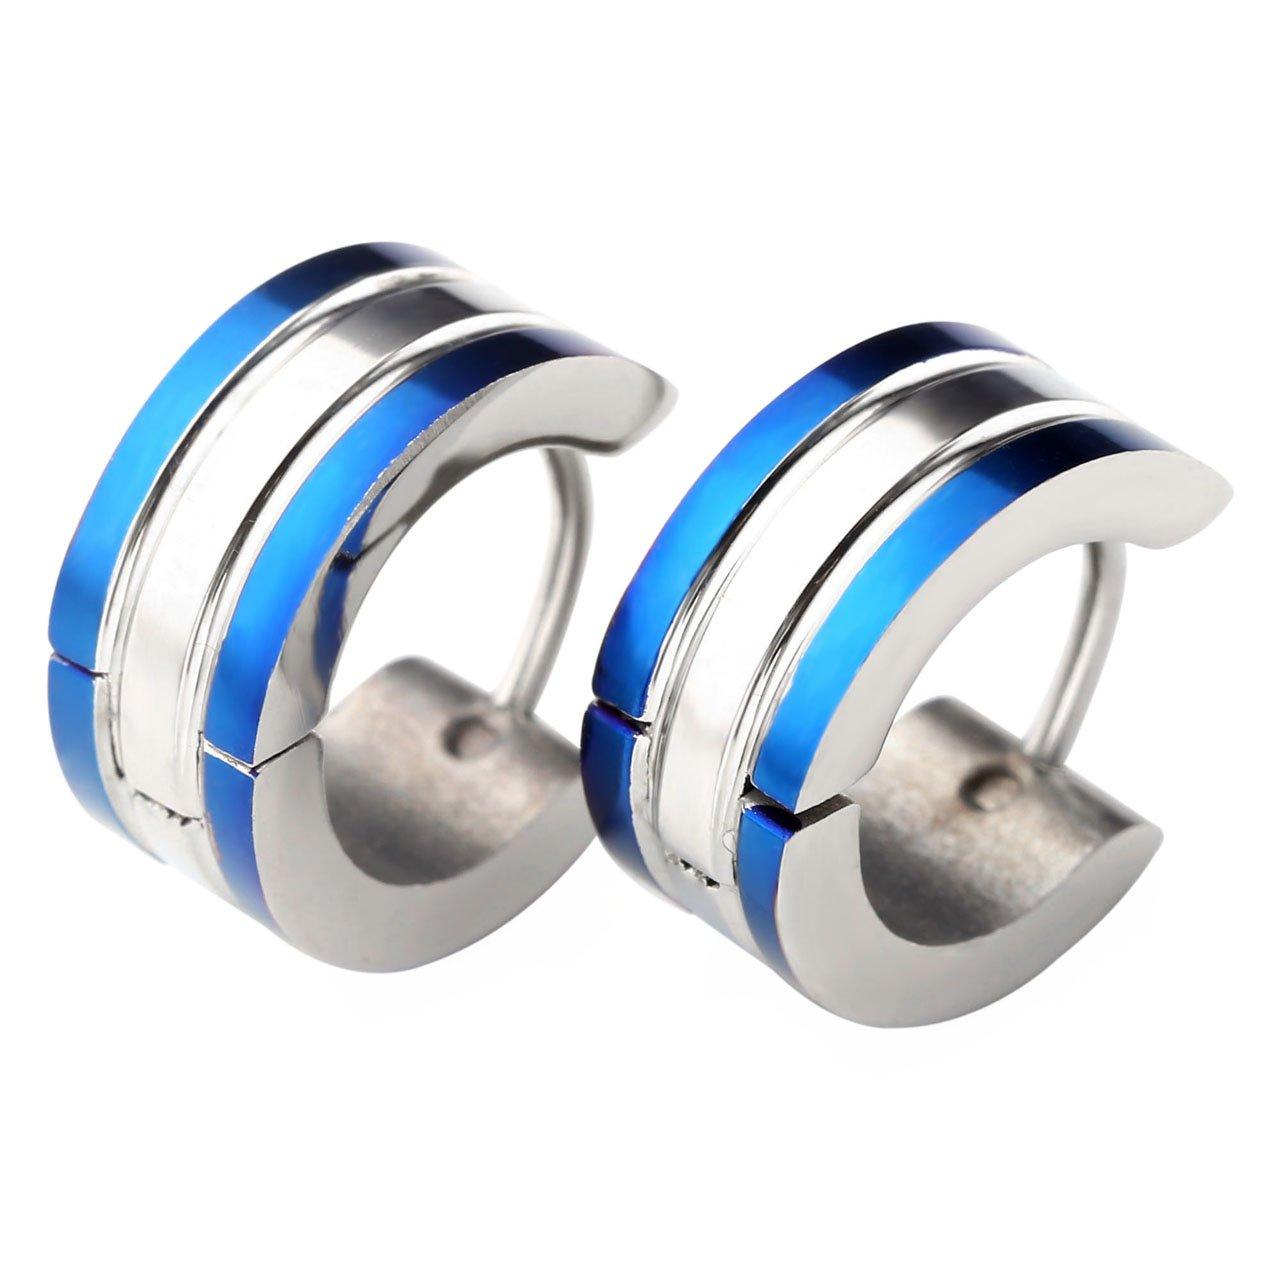 Zysta 2pcs 6MM Silver Blue Stainless Steel Hoop Huggie Earring